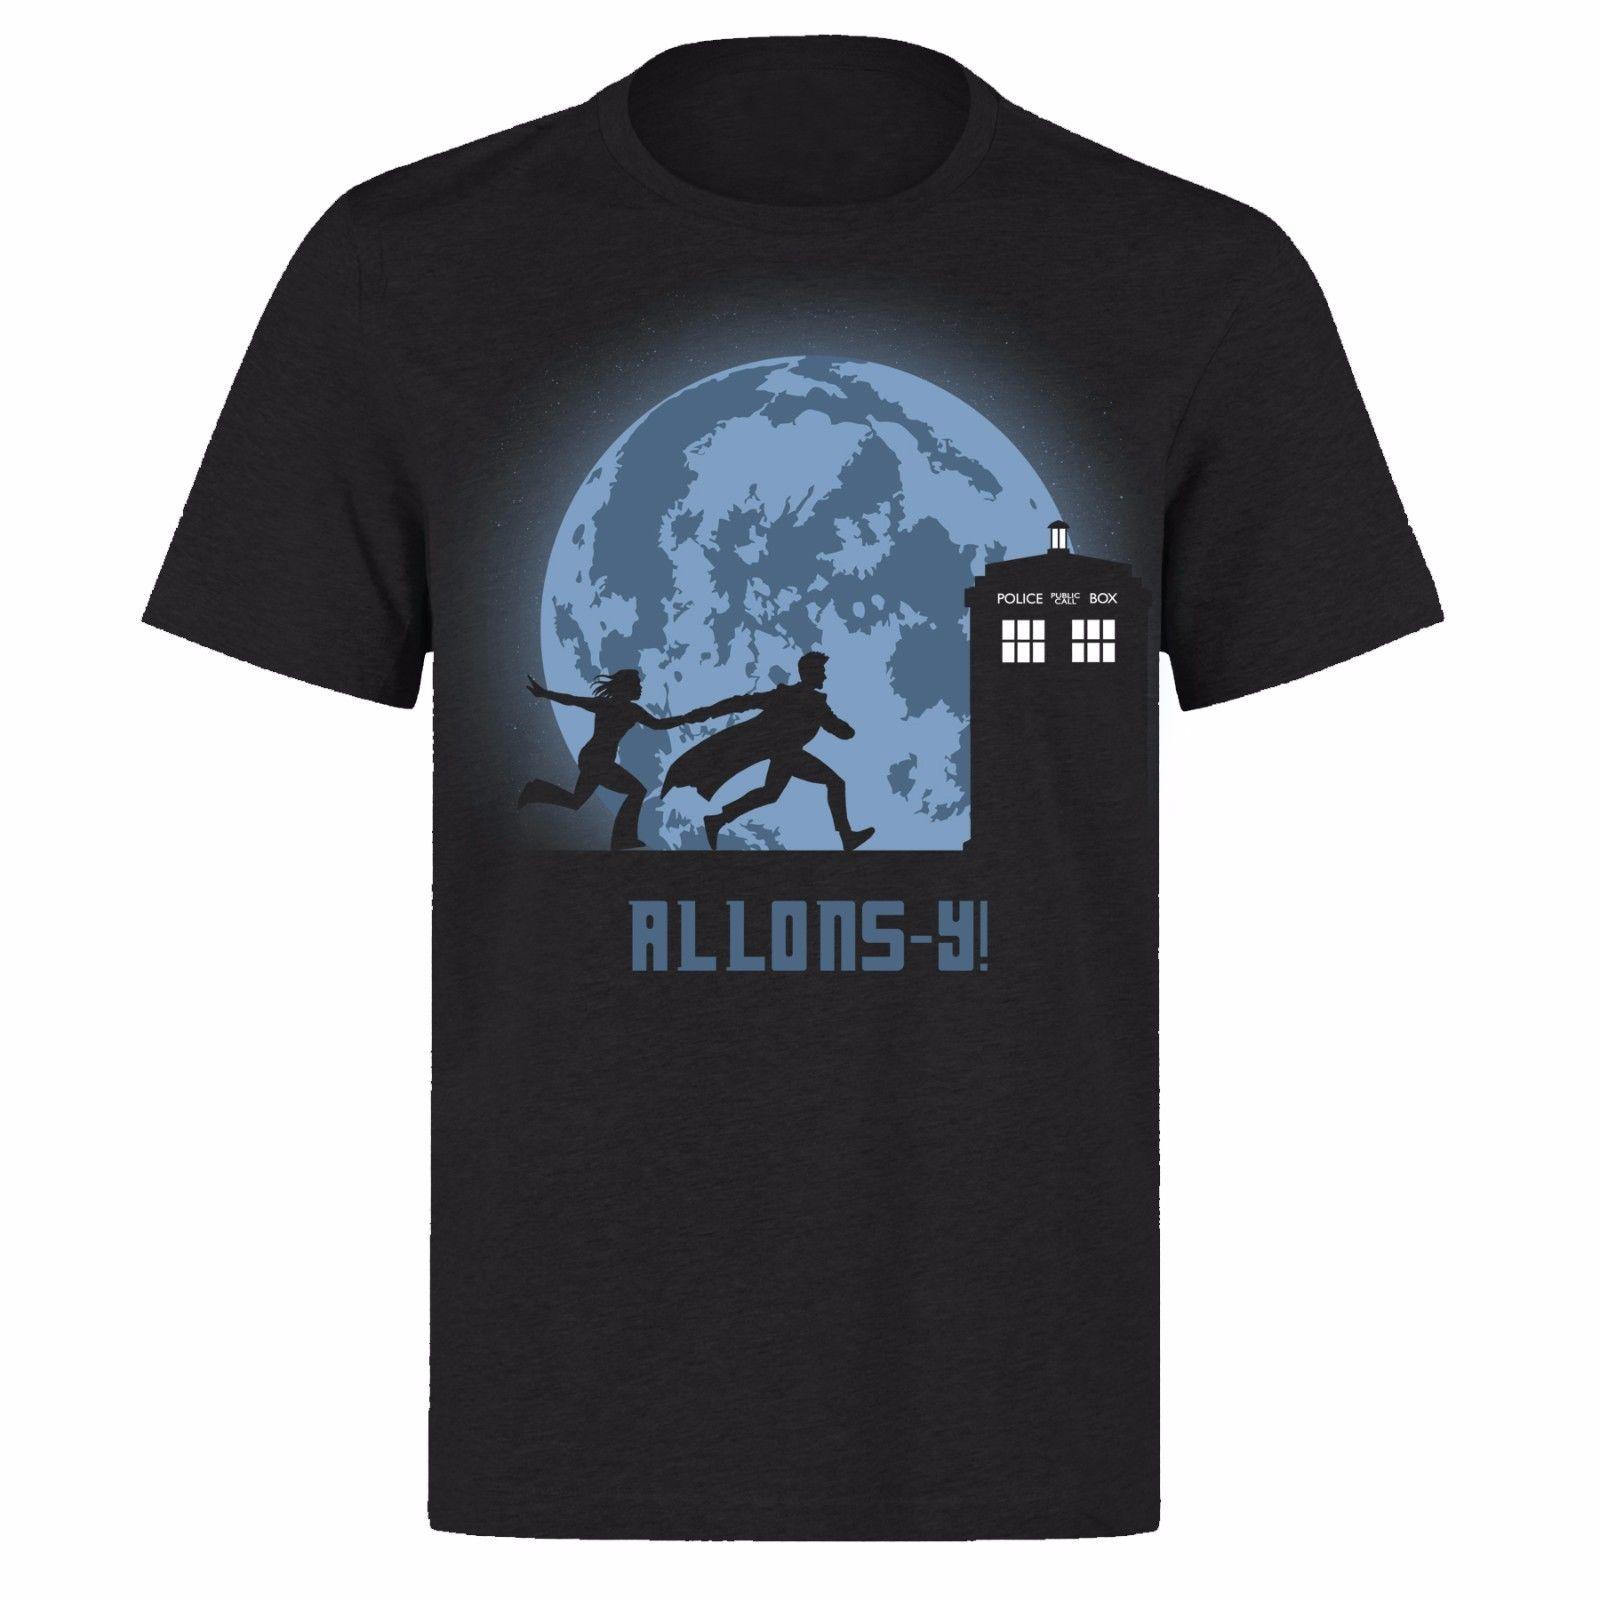 DR WHO LUNA MOON TIME TRAVEL TARDIS DOCTOR WHO UNISEX BLACK PH37 T-SHIRT T Shirt Men Summer Casual Printed Pure Cotton MenS